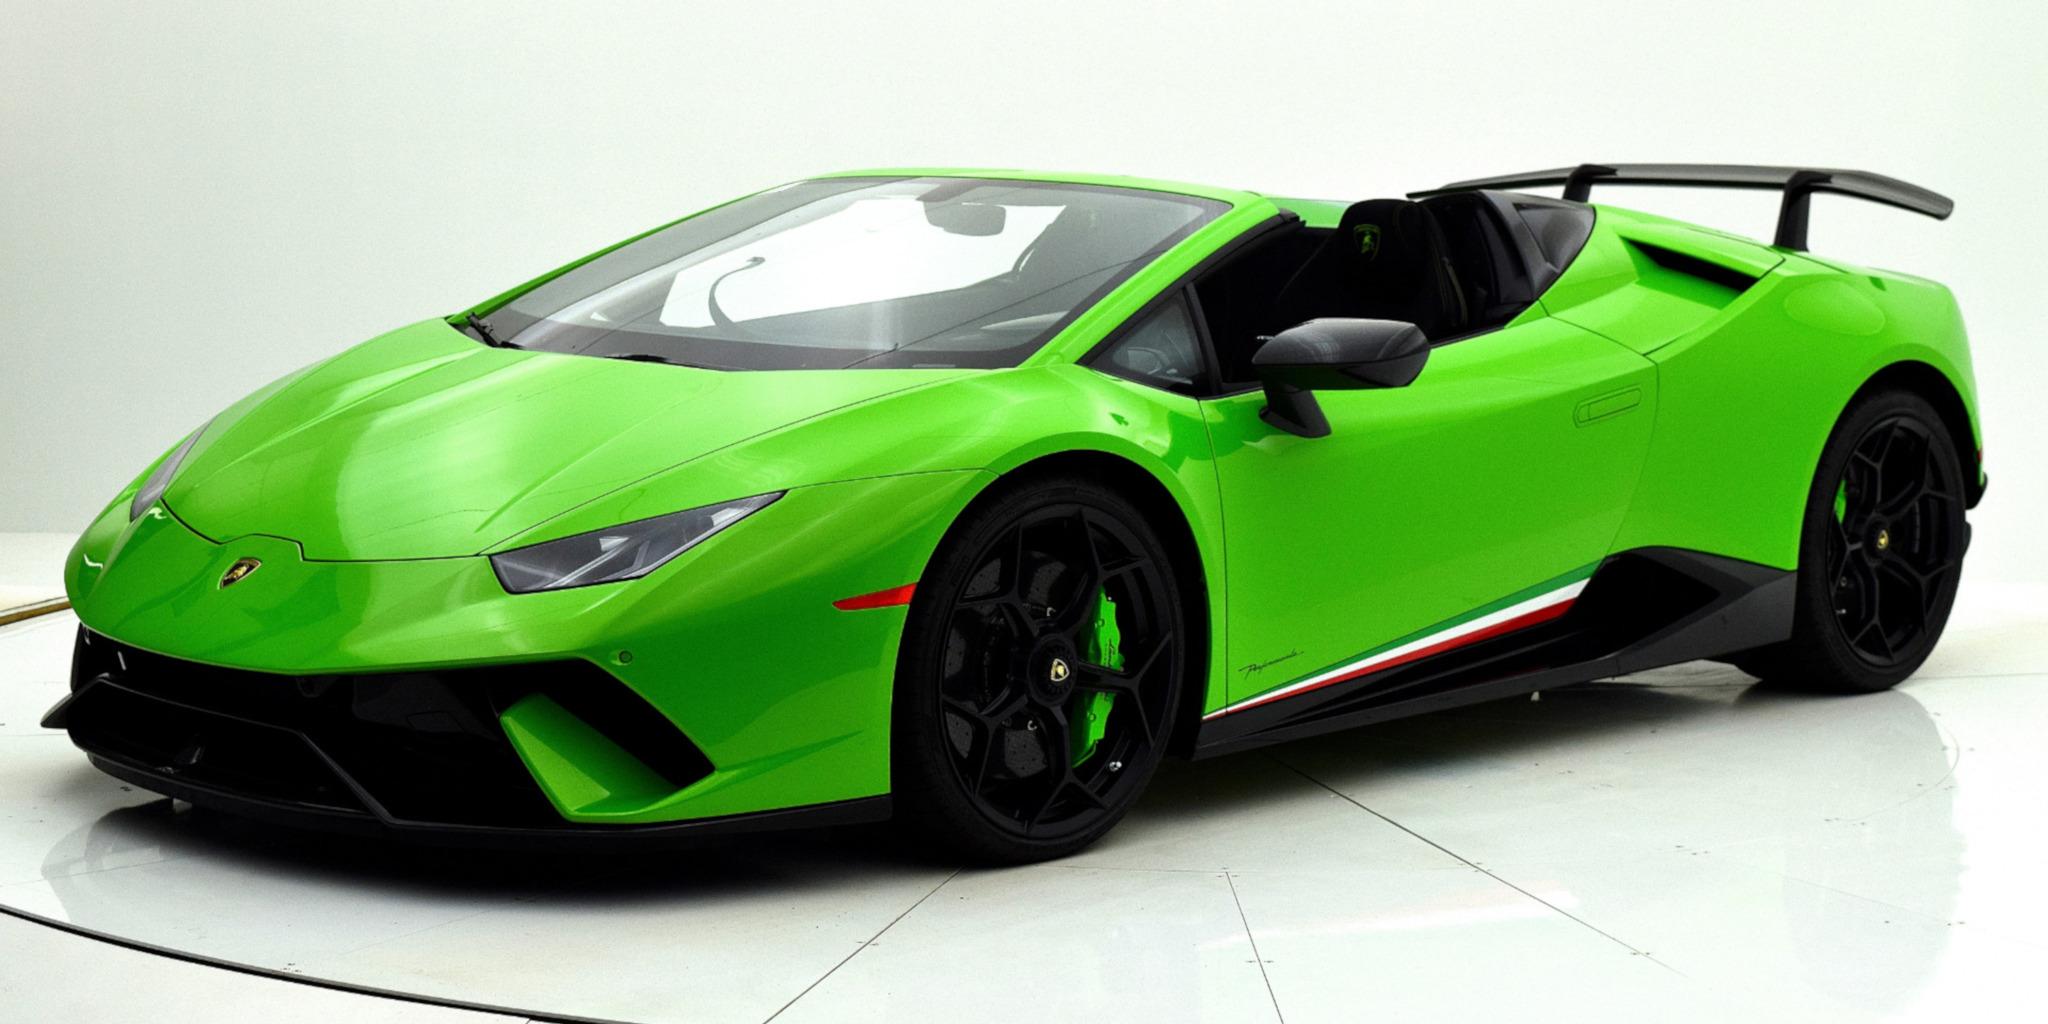 Lamborghini Huracan Performante Spyder Up Cars